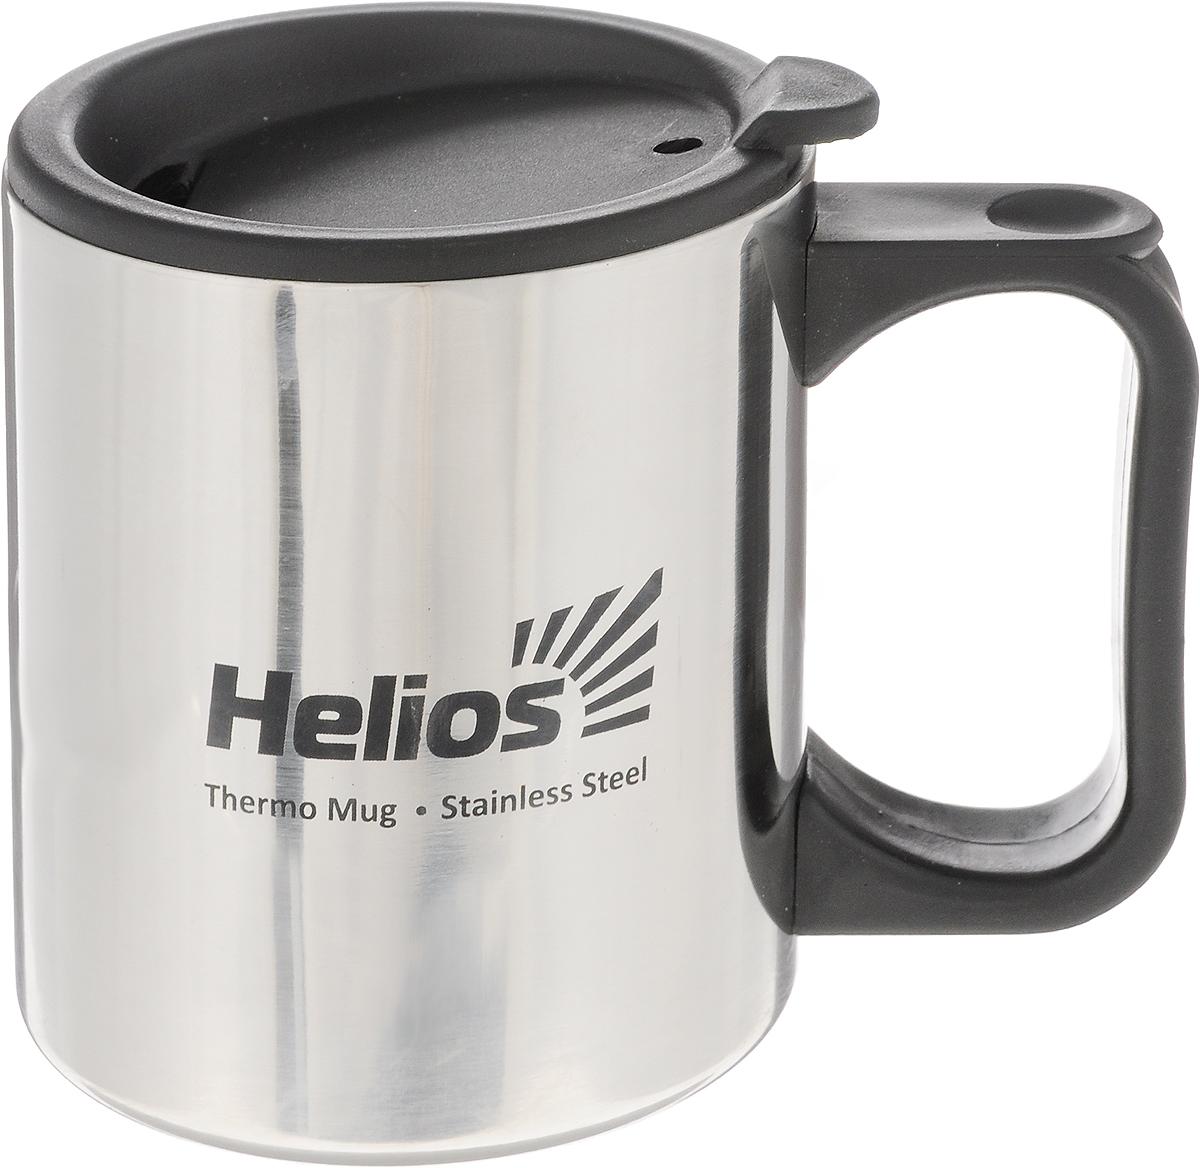 "Термокружка Helios""HS TK-006"",с крышкой-поилкой, 300 мл"